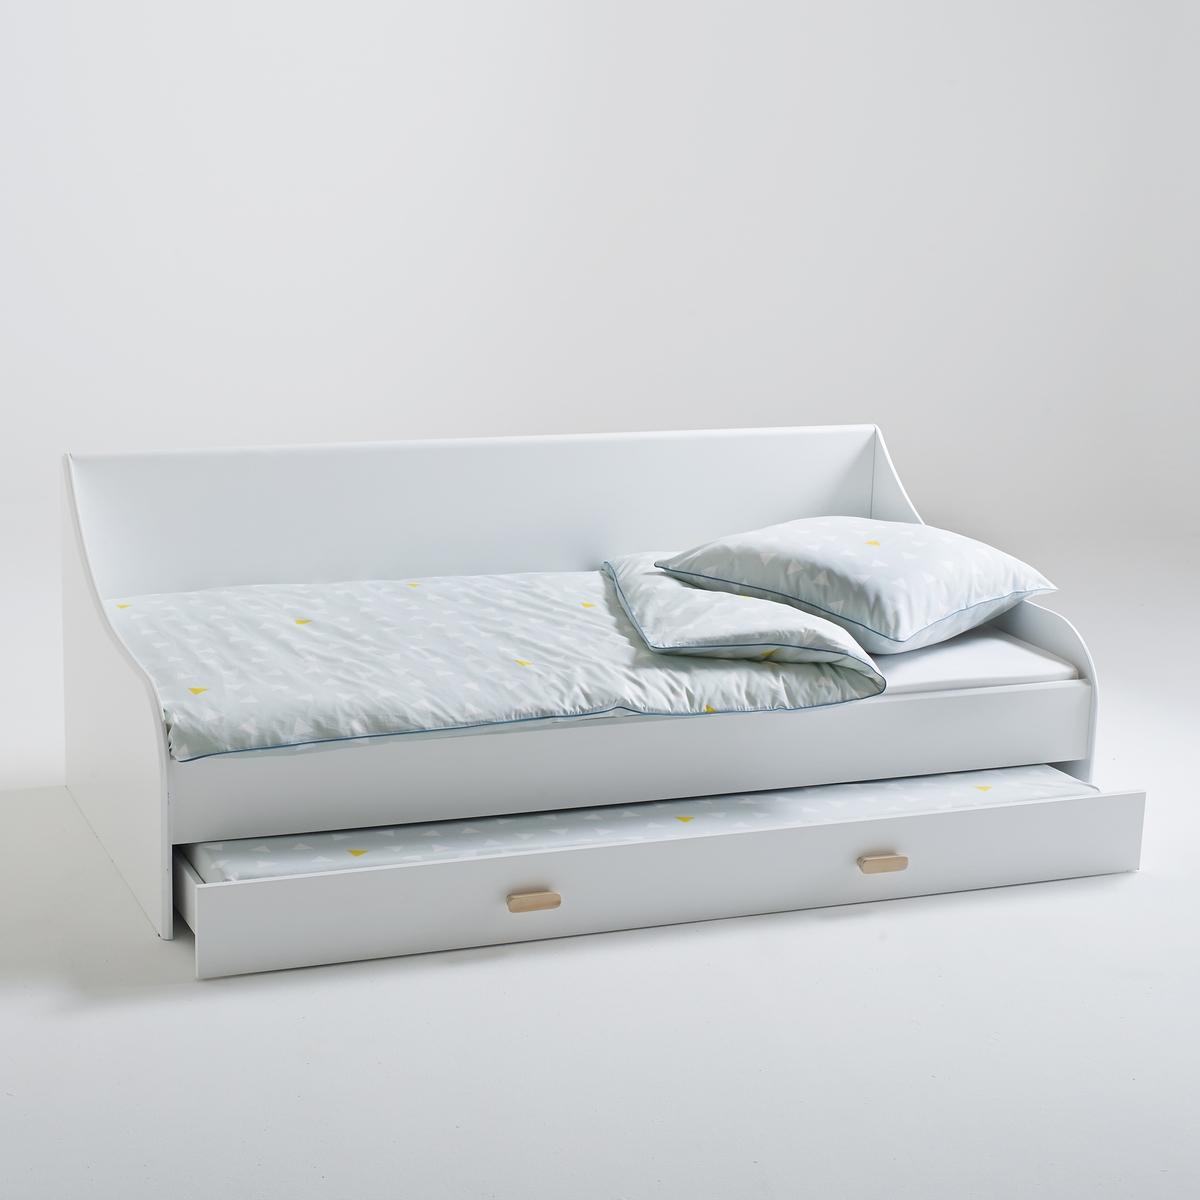 Кровать-банкетка La Redoute Раздвижная JIMI 90 x 190 см белый кровать la redoute с основой под матрас trianon 140 x 190 см белый